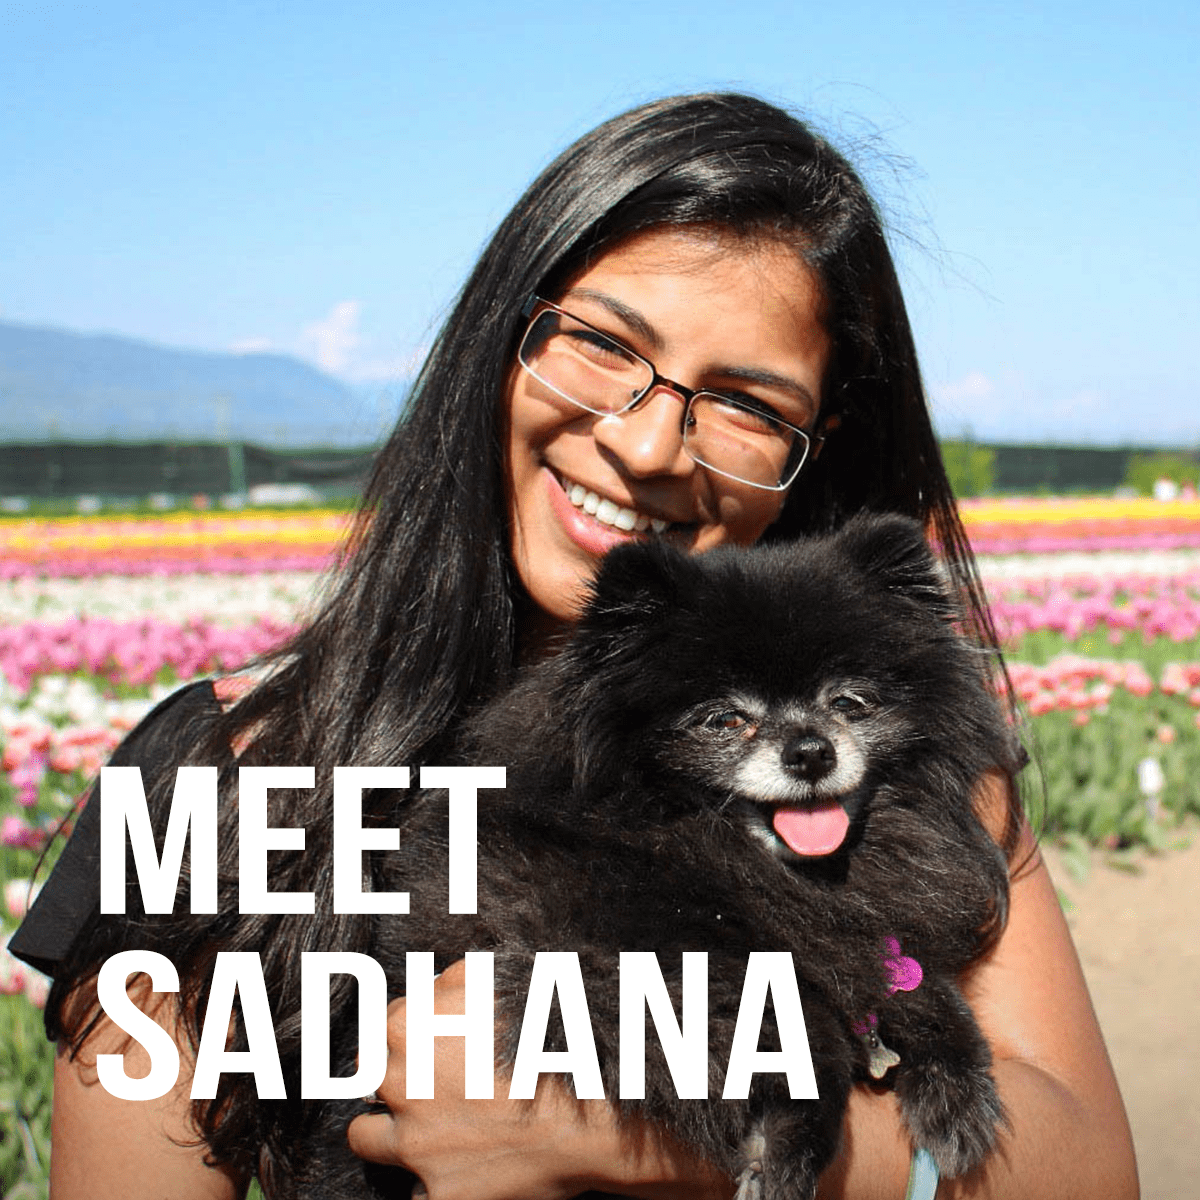 Meet Sadhana